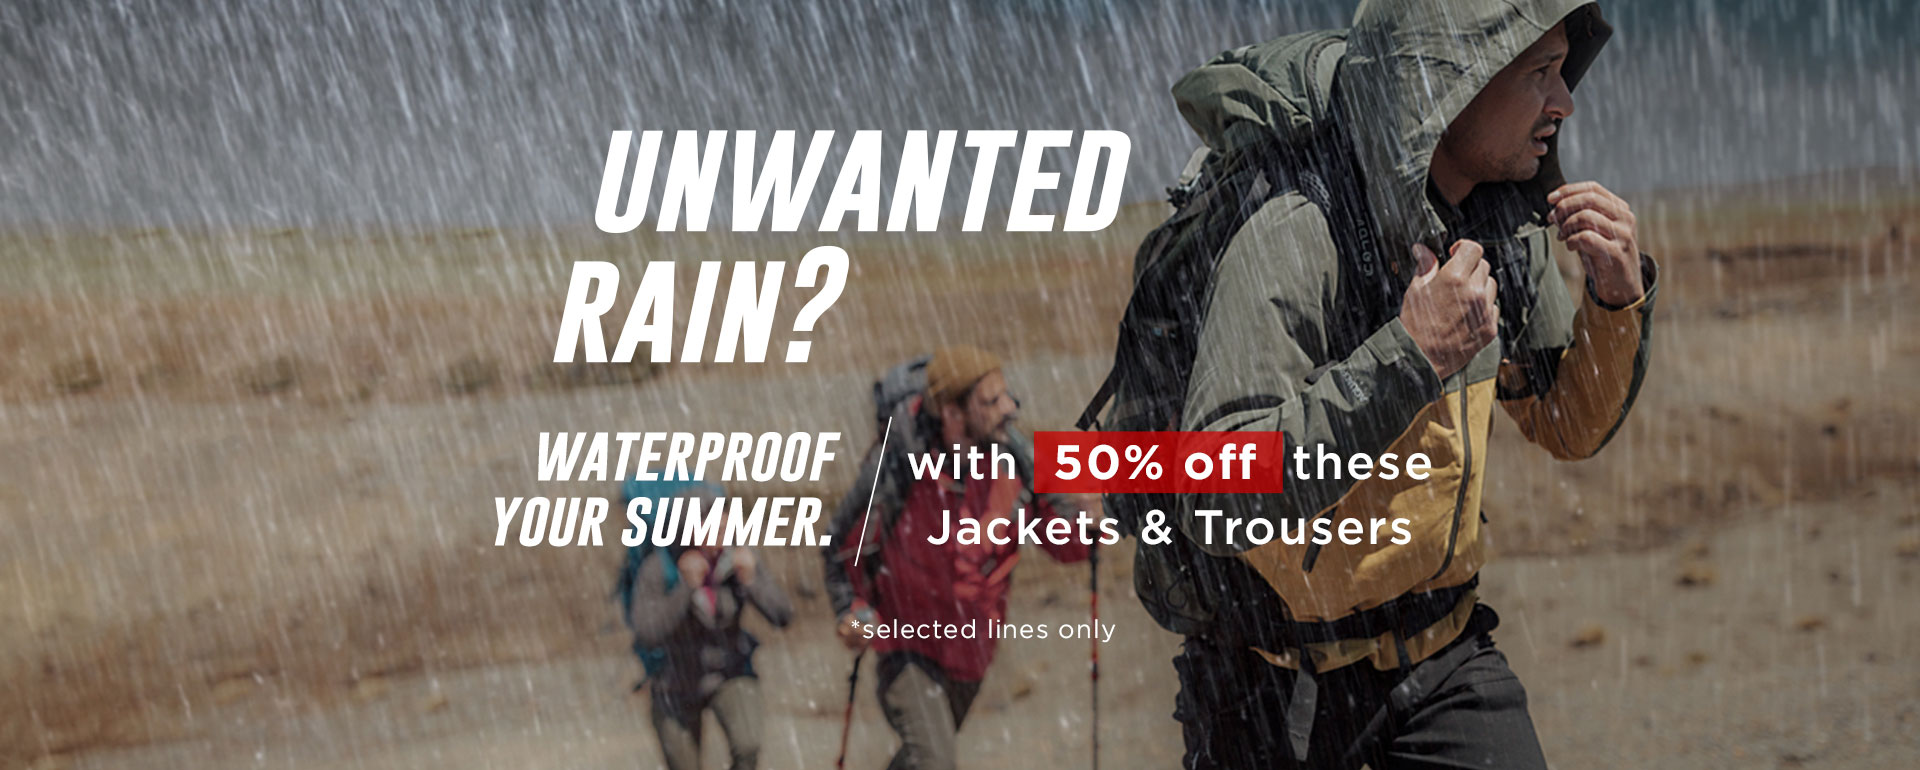 Unwanted Rain